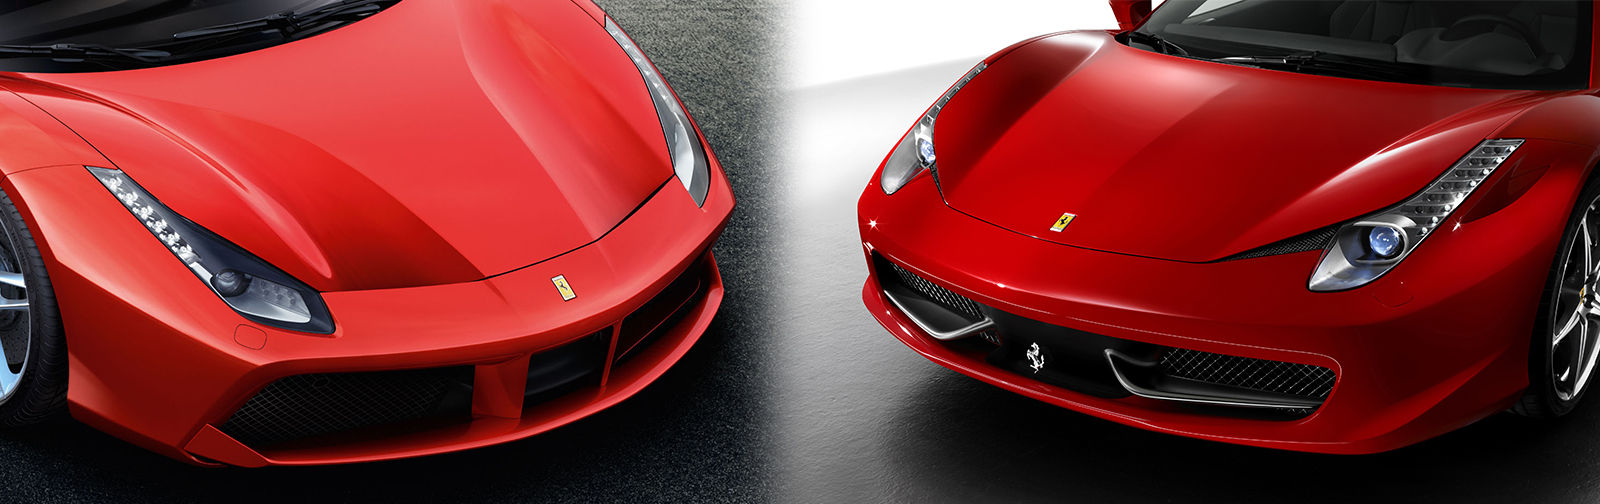 488 gtb on the left 458 italia on the right